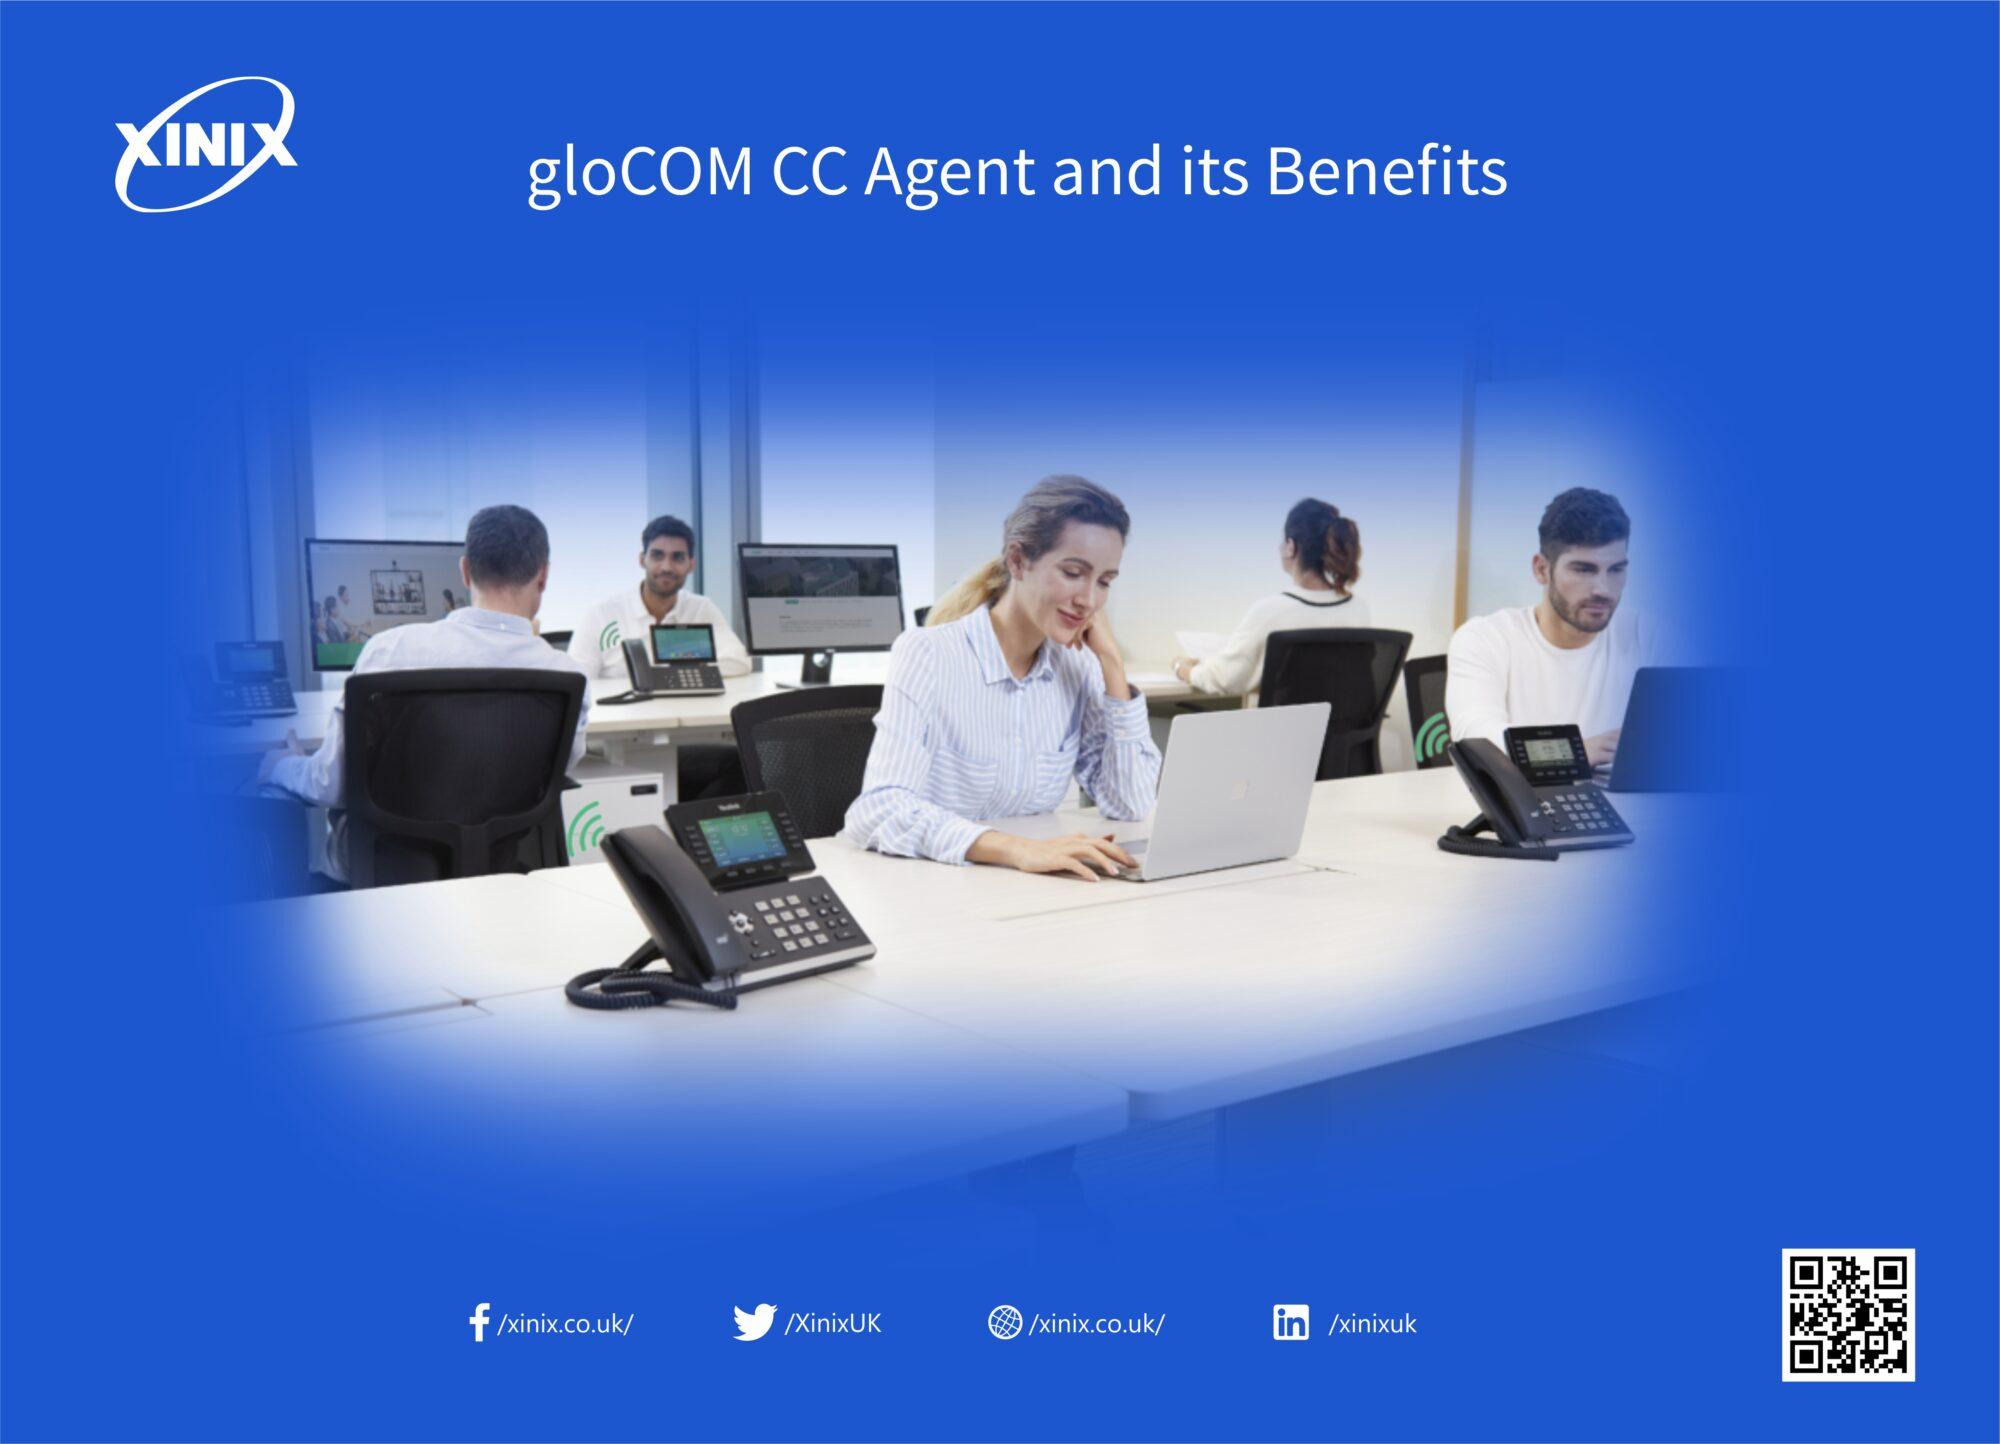 gloCOM CC Agent and its Benefits